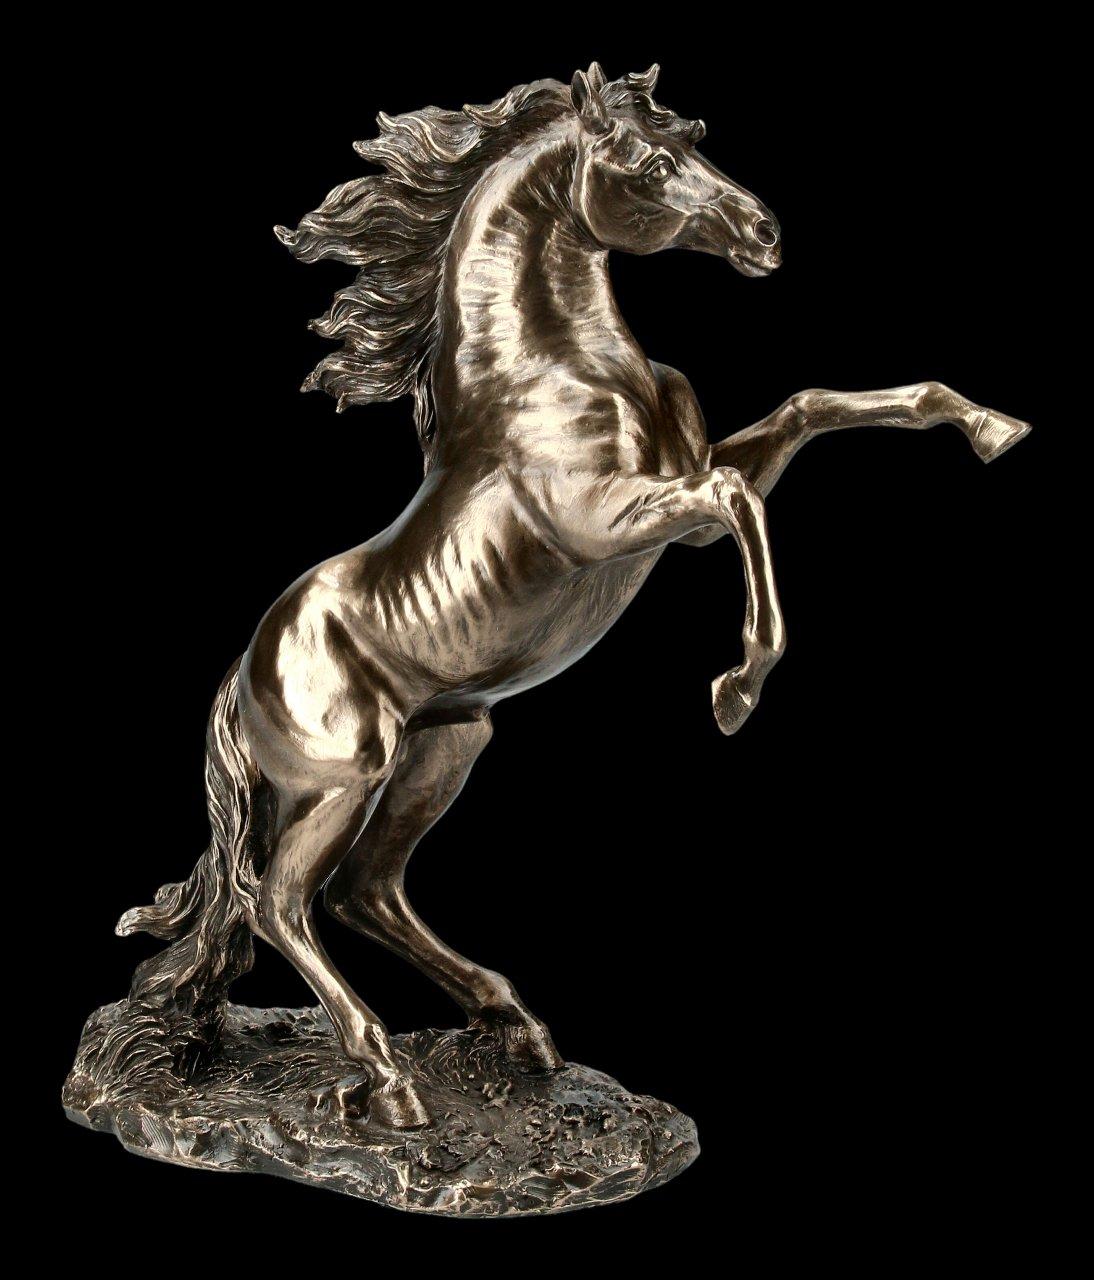 Horse Figurine - Wild Horse Bolt